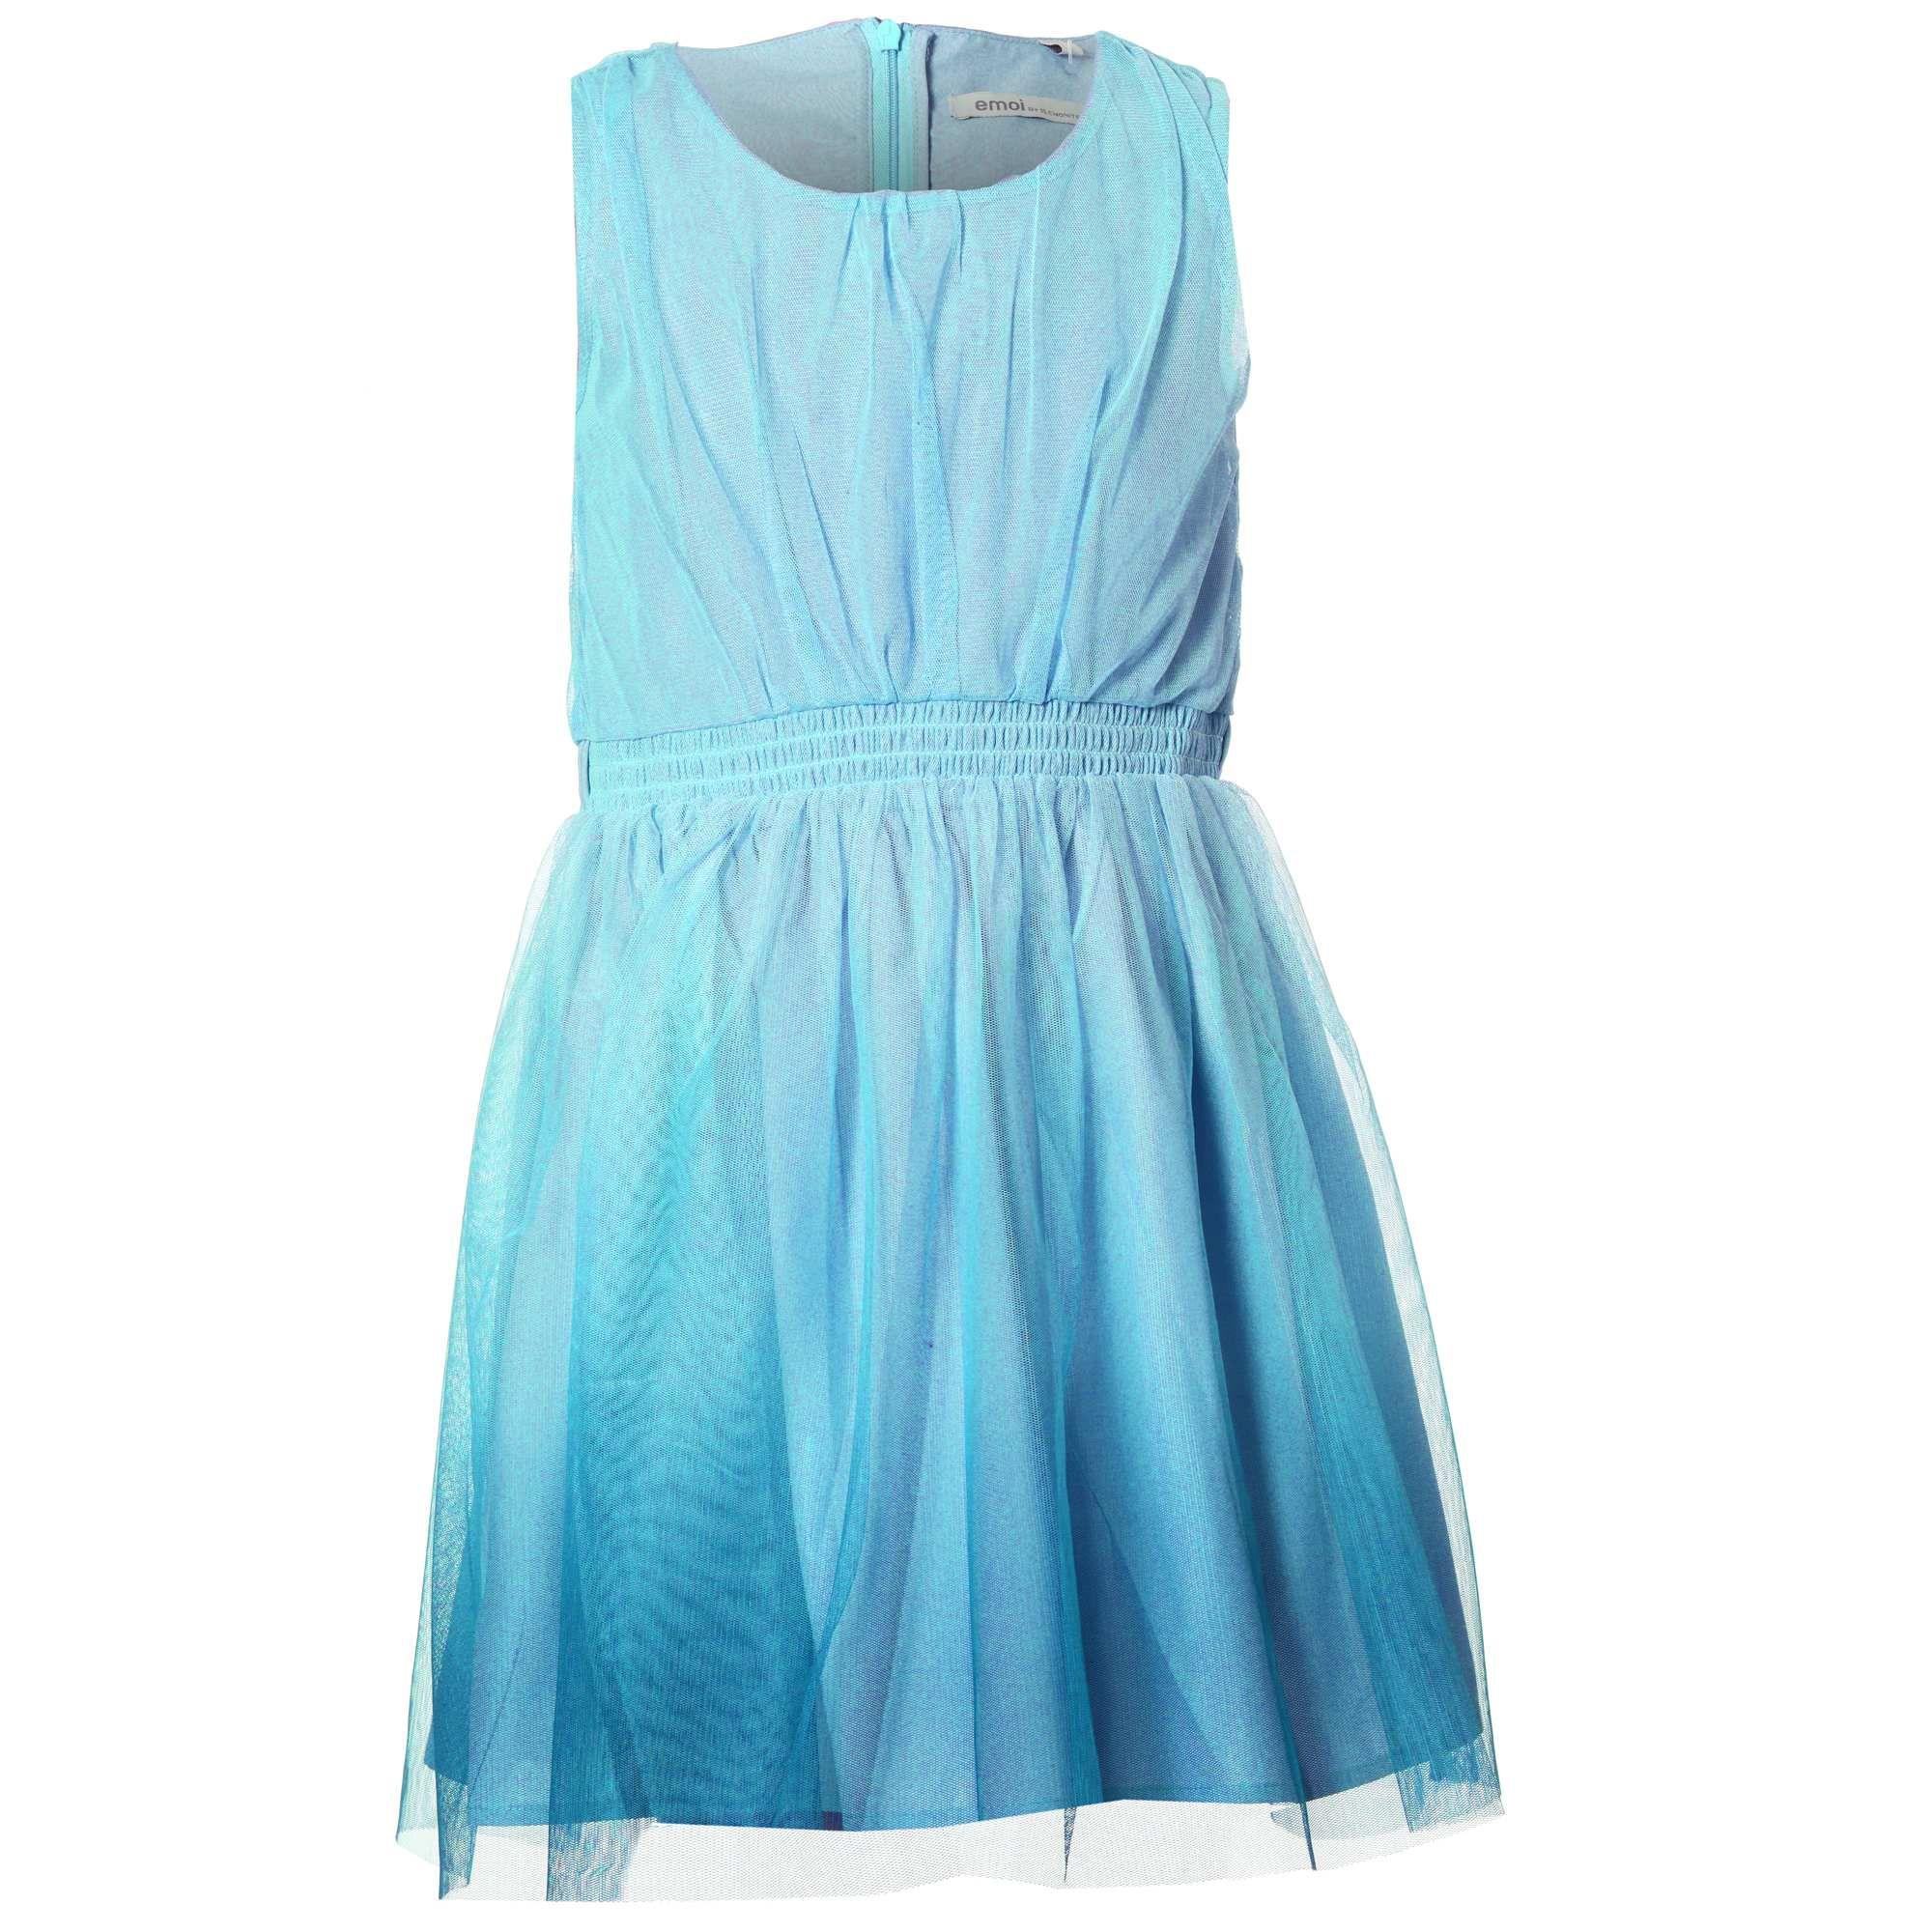 robe tulle effet tie and dye petite fille kiabi 17 00 florence pinterest colorants. Black Bedroom Furniture Sets. Home Design Ideas